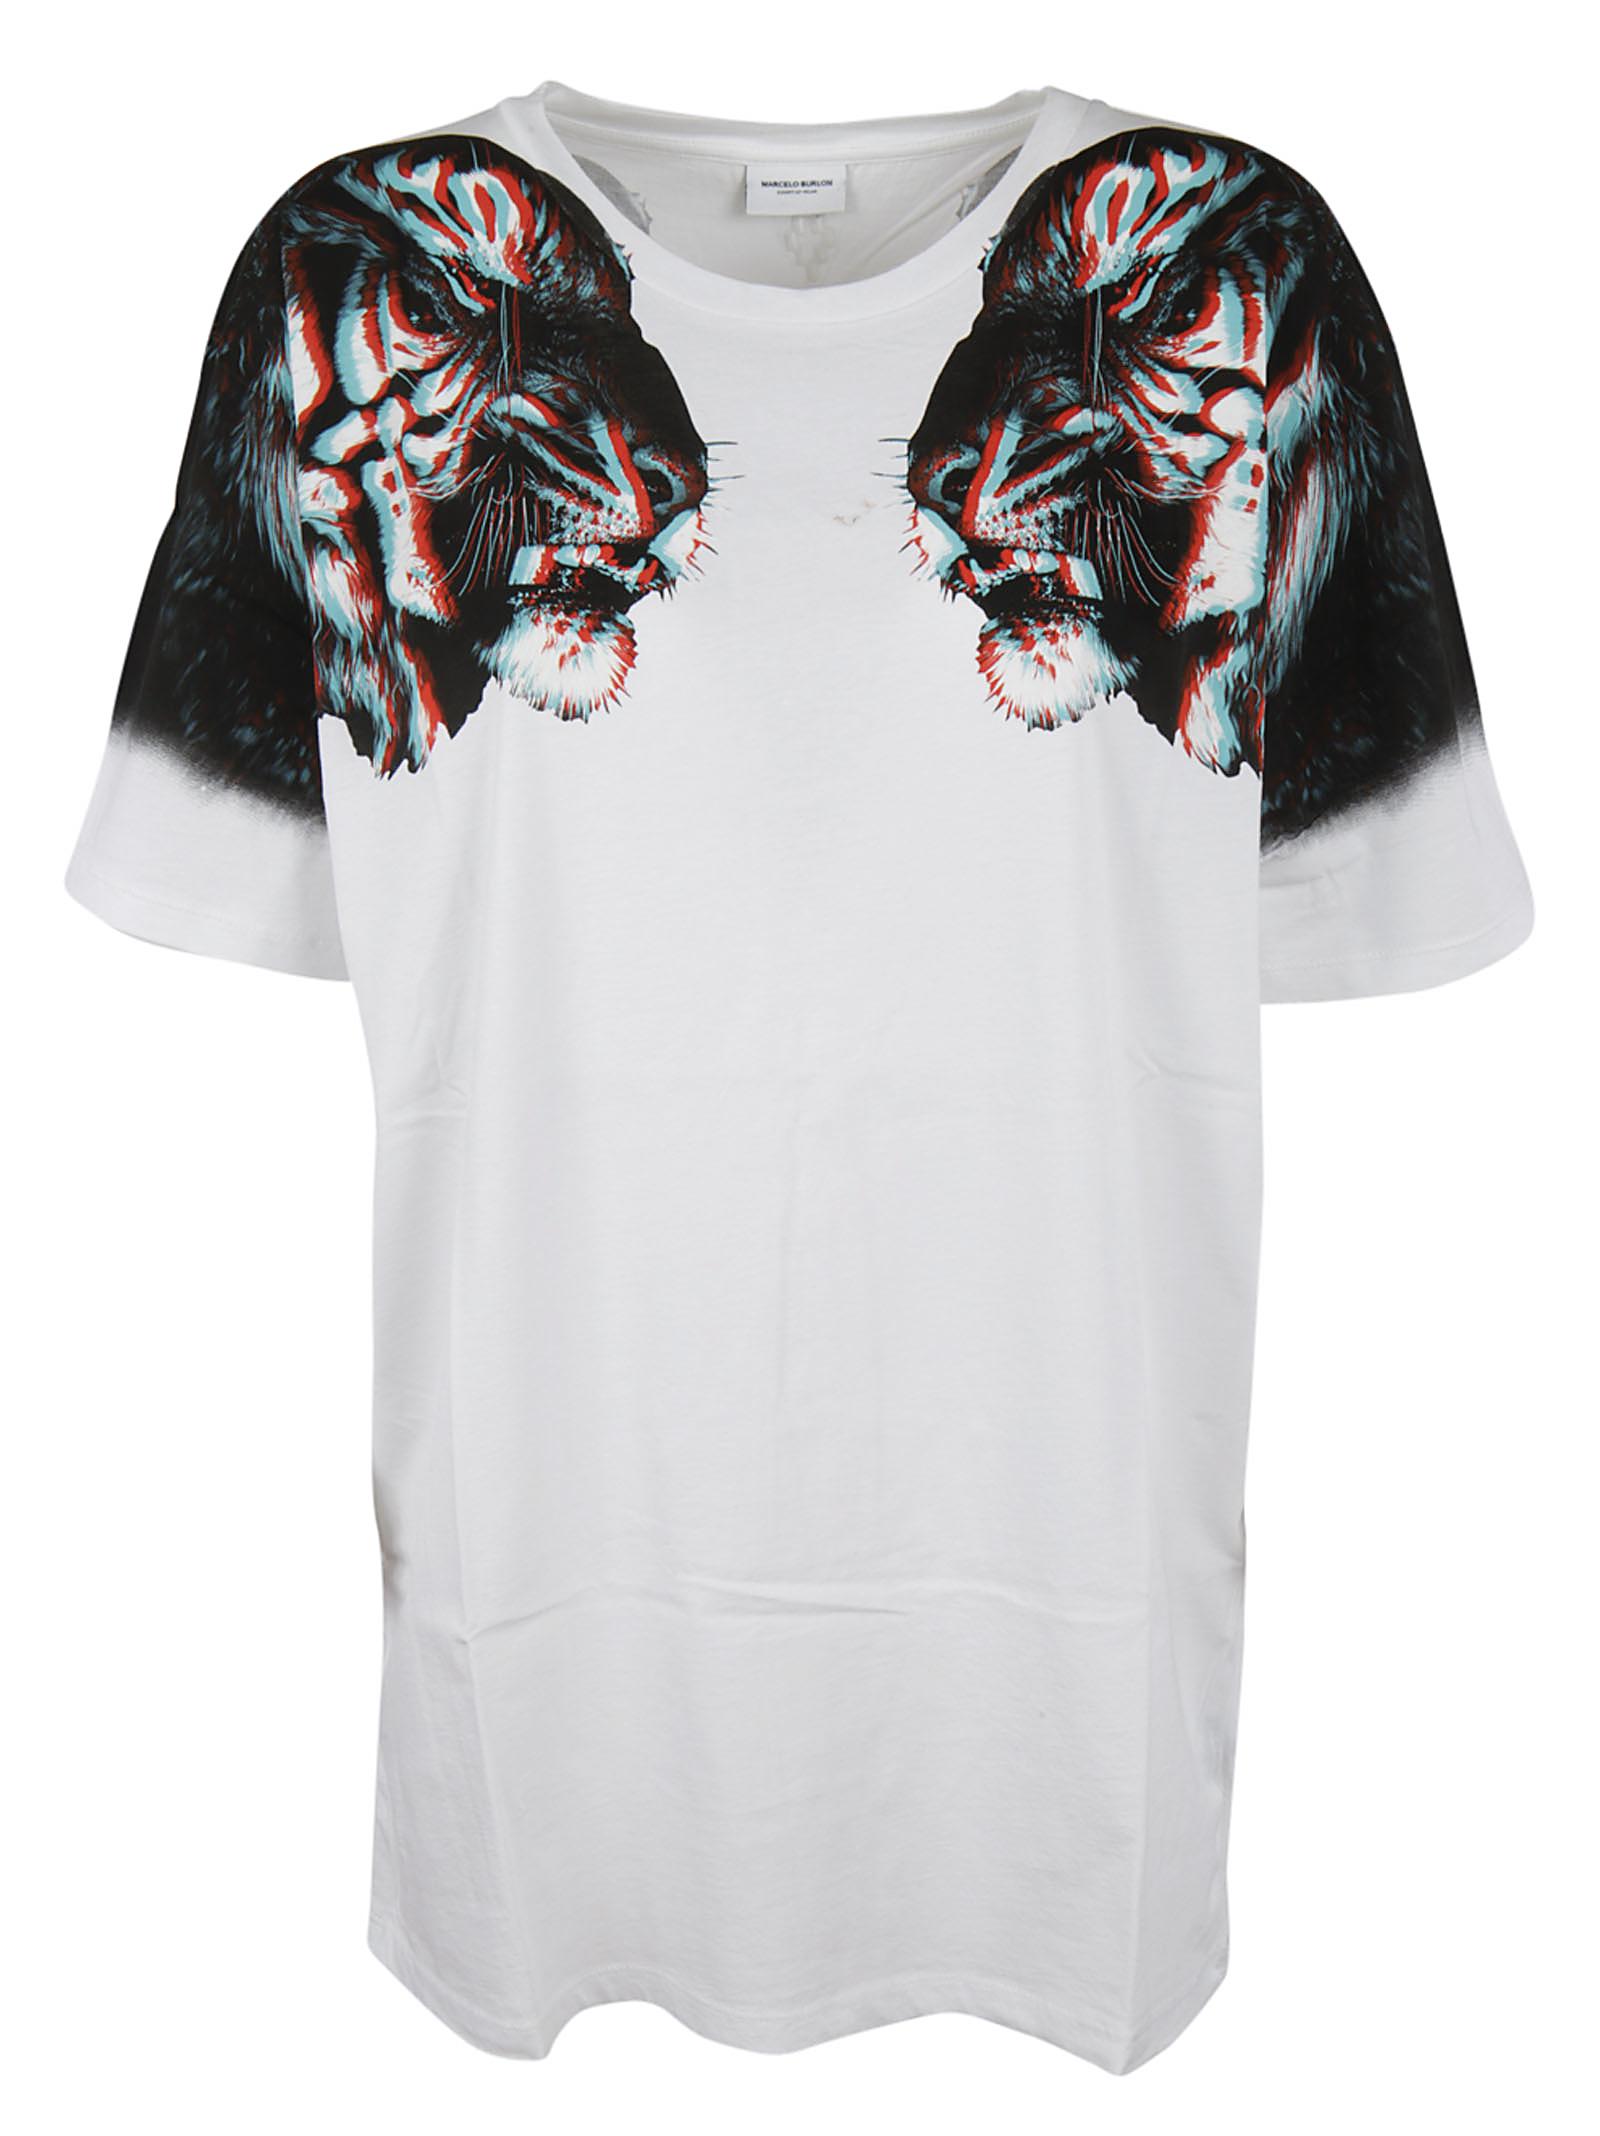 MARCELO BURLON WOMAN Marcelo Burlon Tiger Print T-shirt